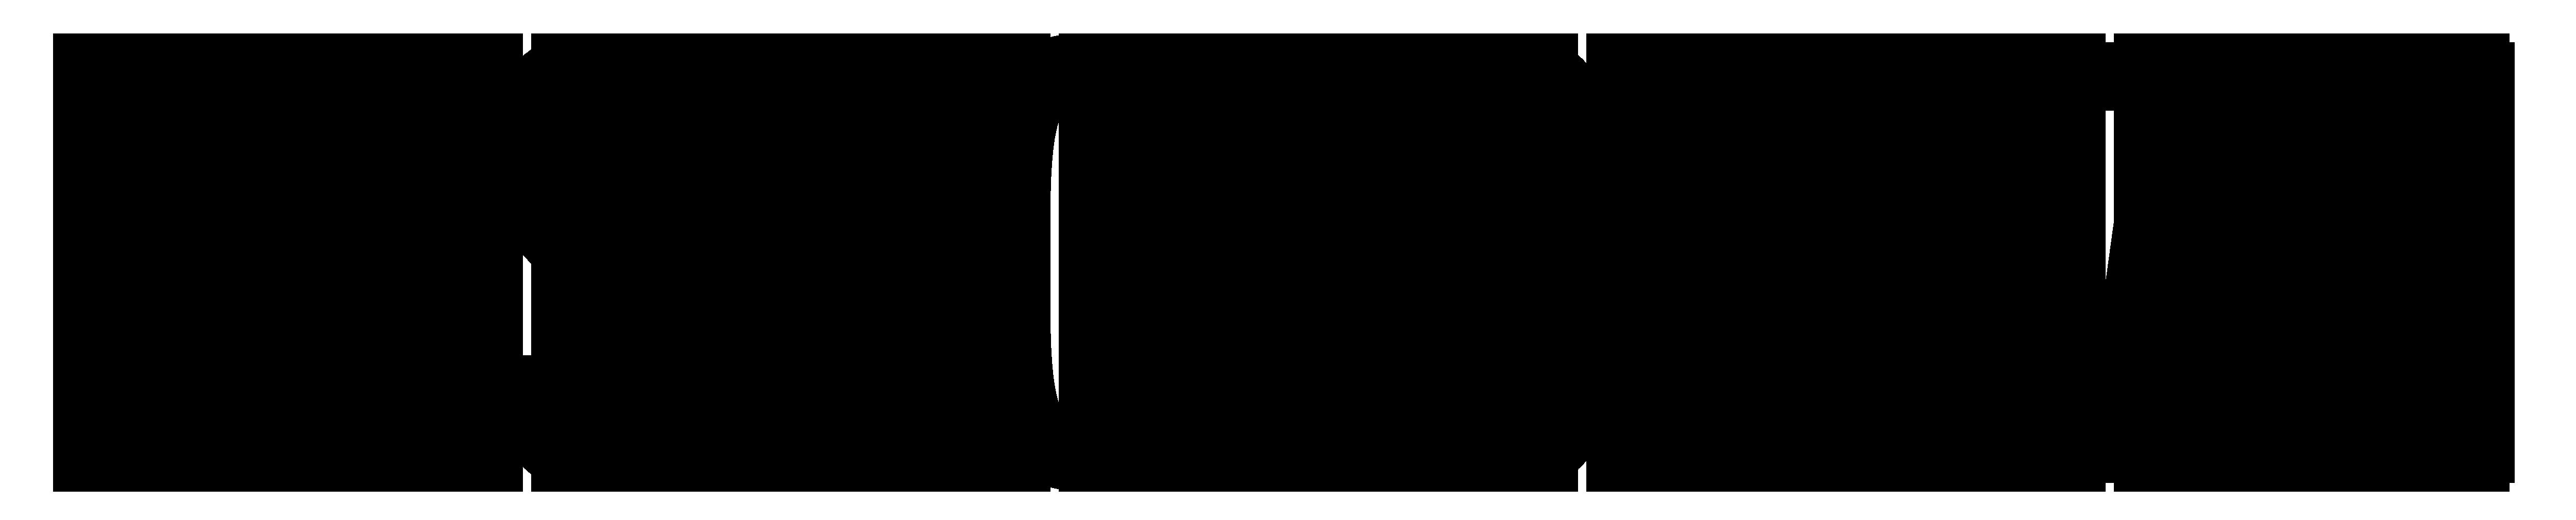 https://sabrinaphilipp.com/wp-content/uploads/2018/02/bw-Cosmopolitan_logo_wordmark_logotype.png